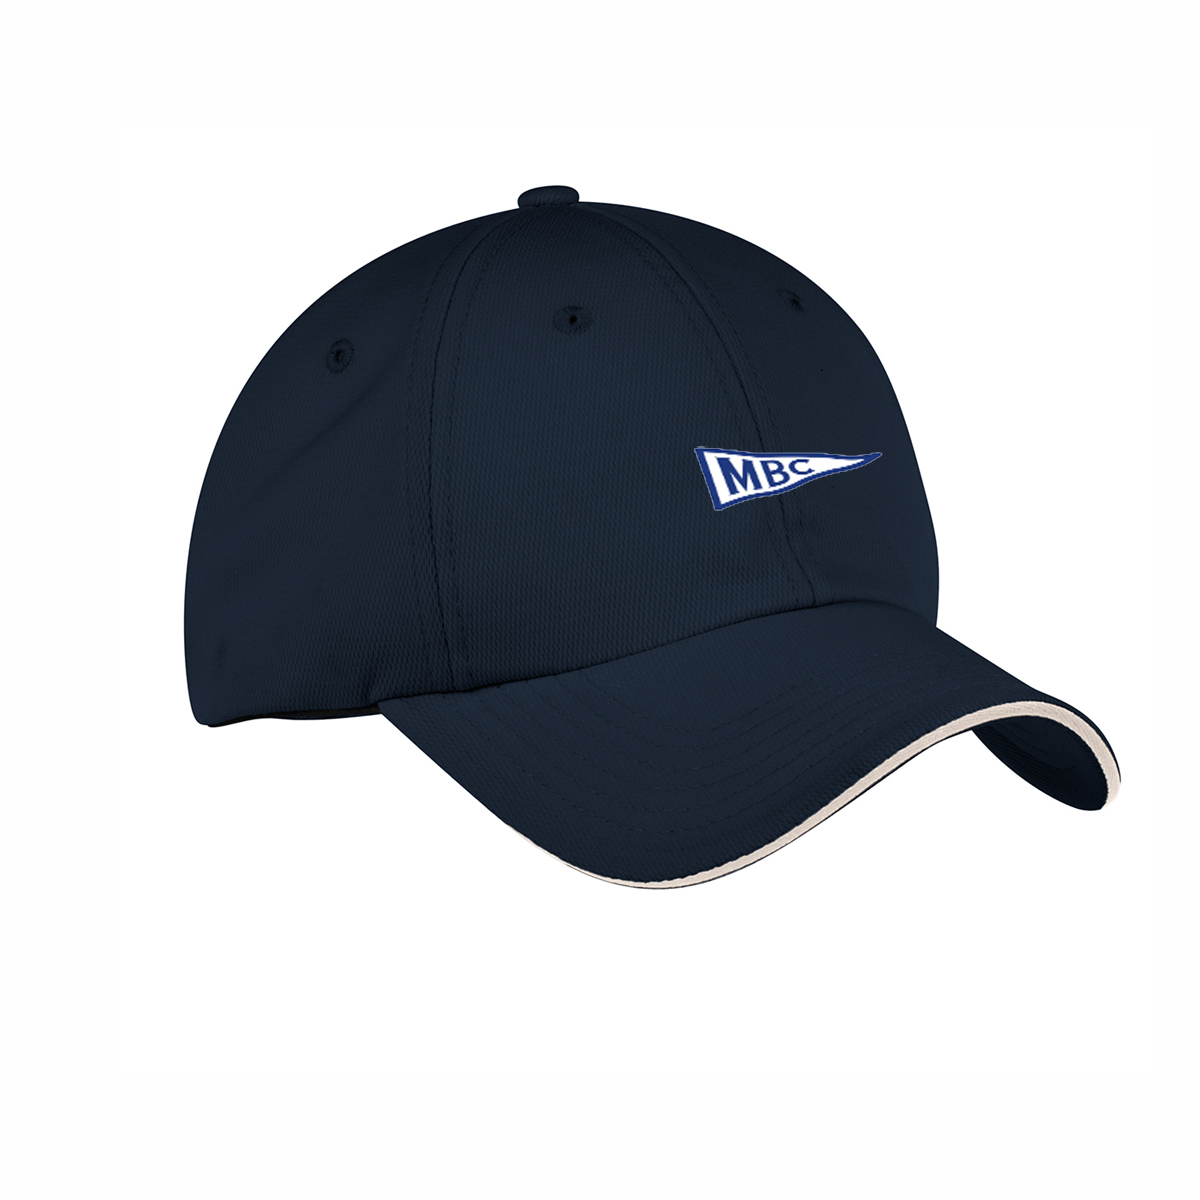 MONMOUTH BC DRY ZONE CAP